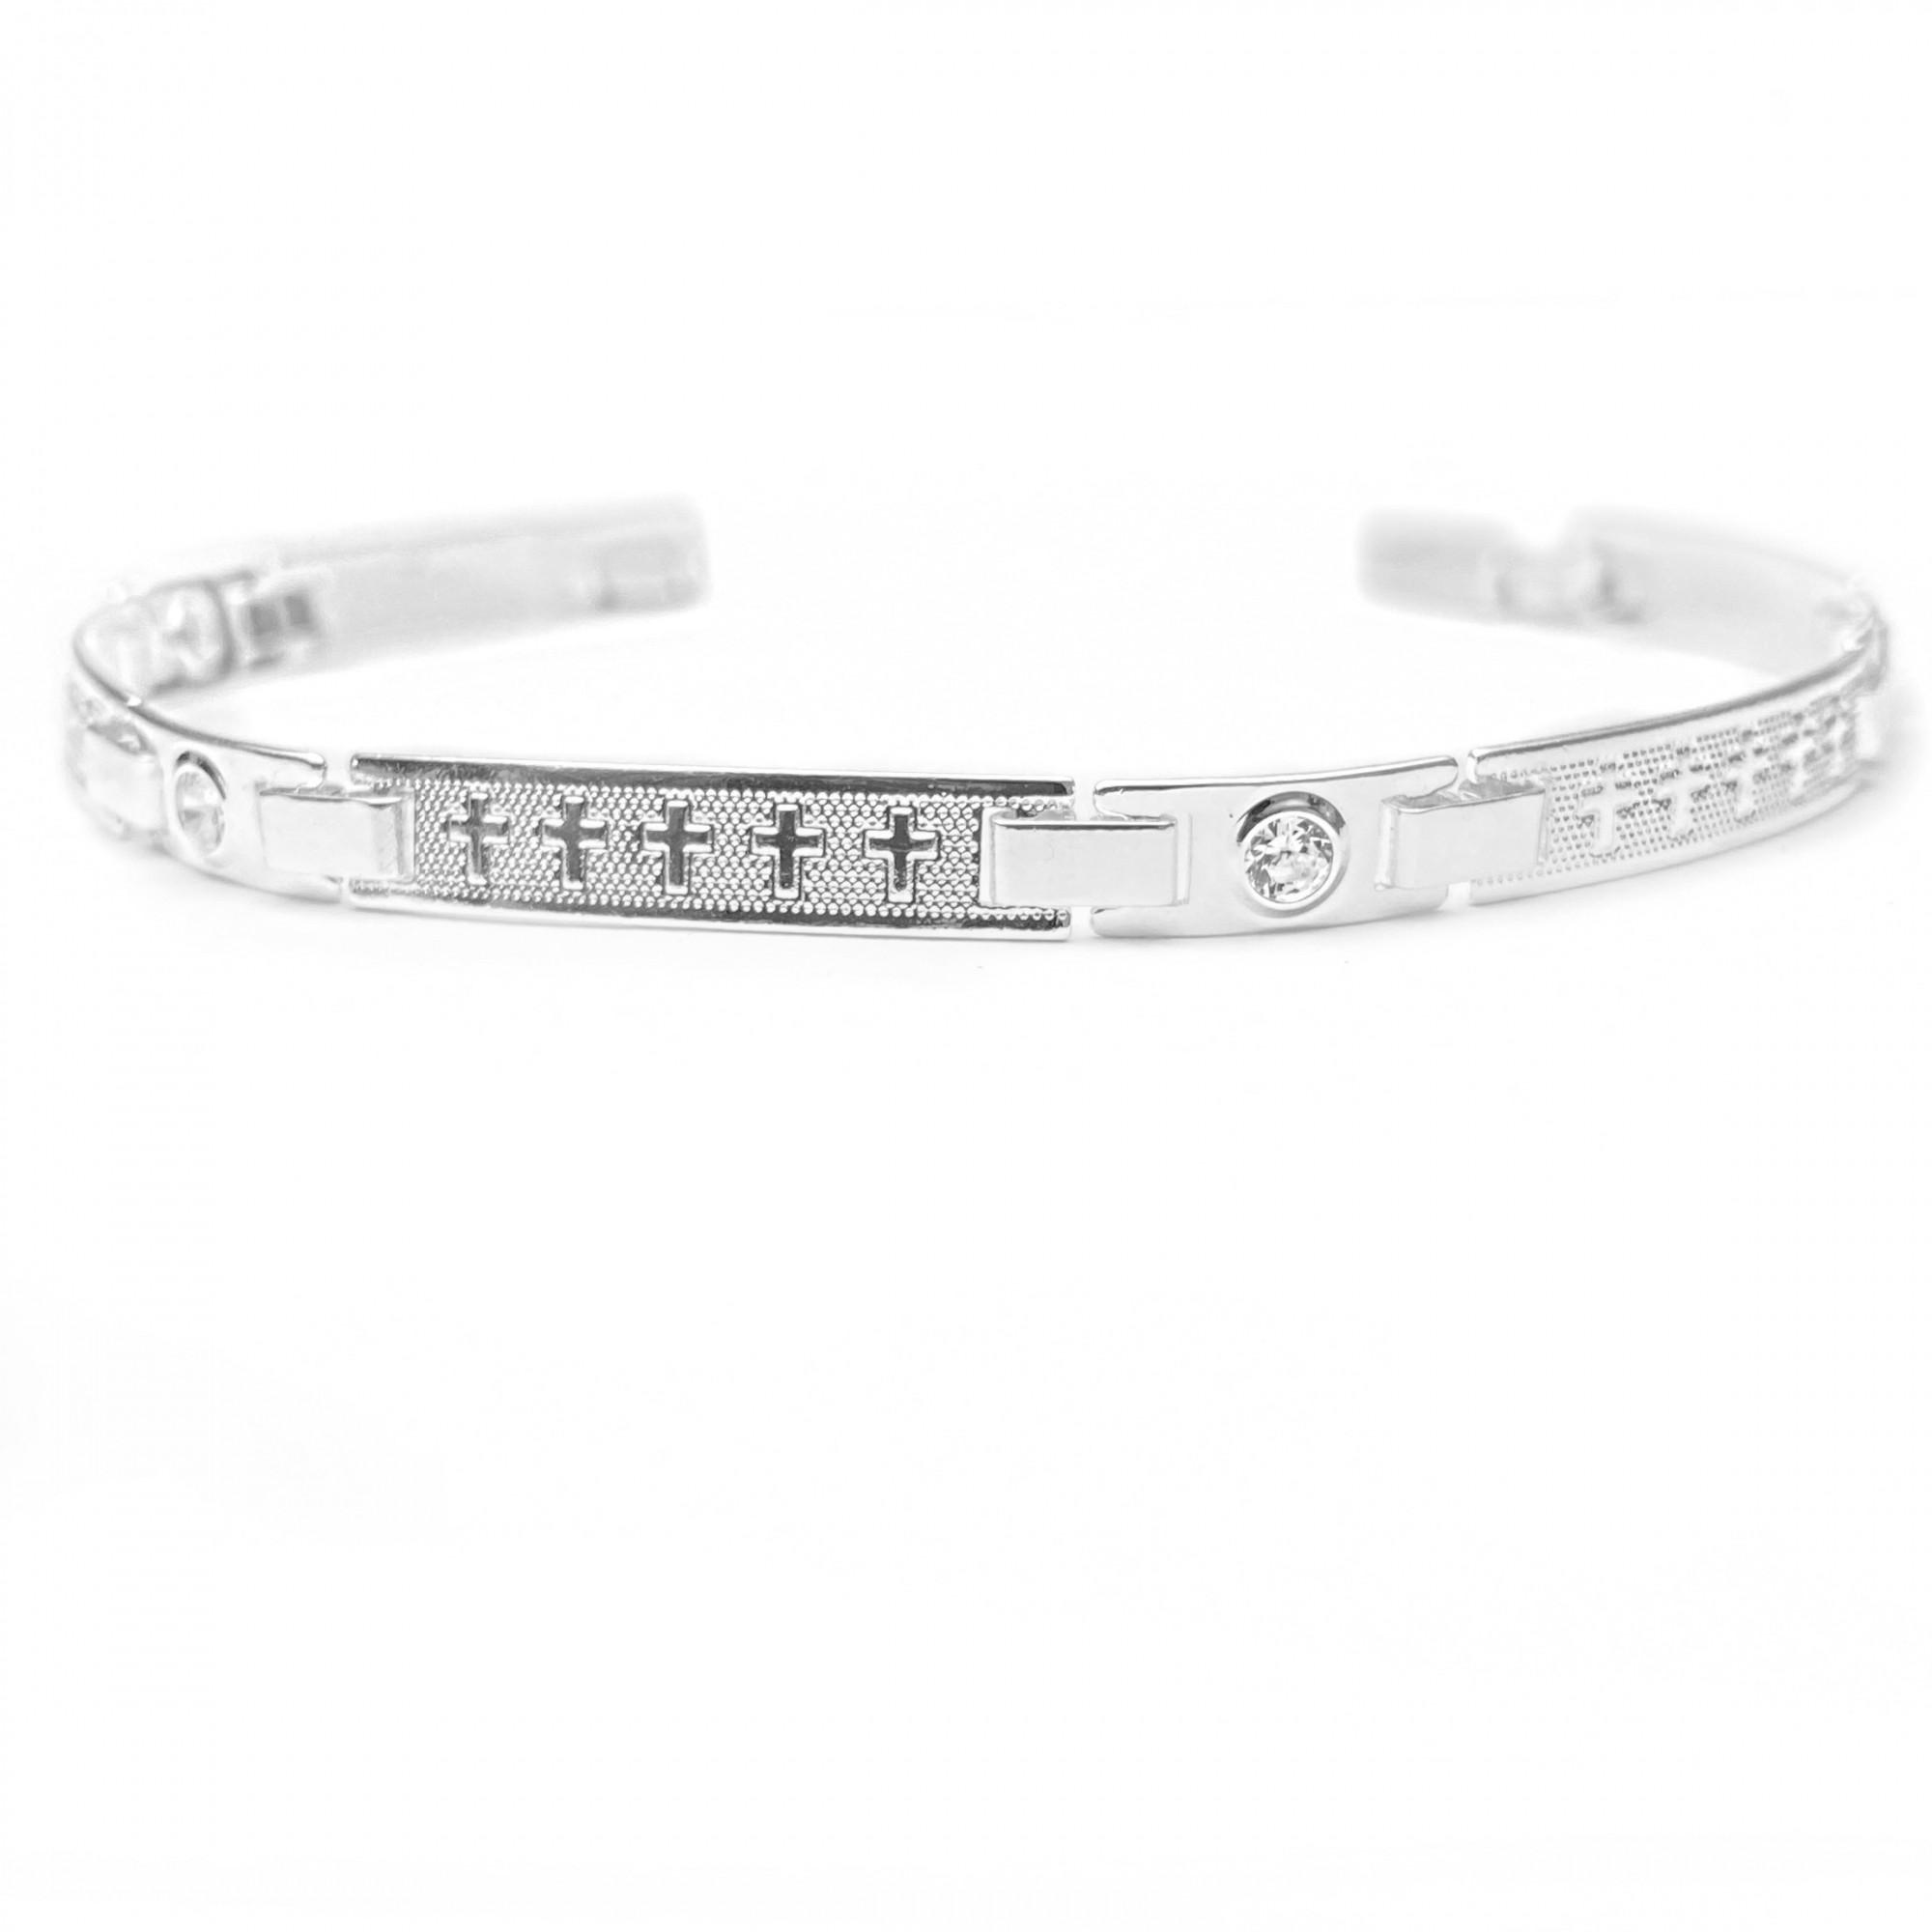 Bracelete Cruz Pedra De Zircônia Branca 5mm (Banho Prata 925)